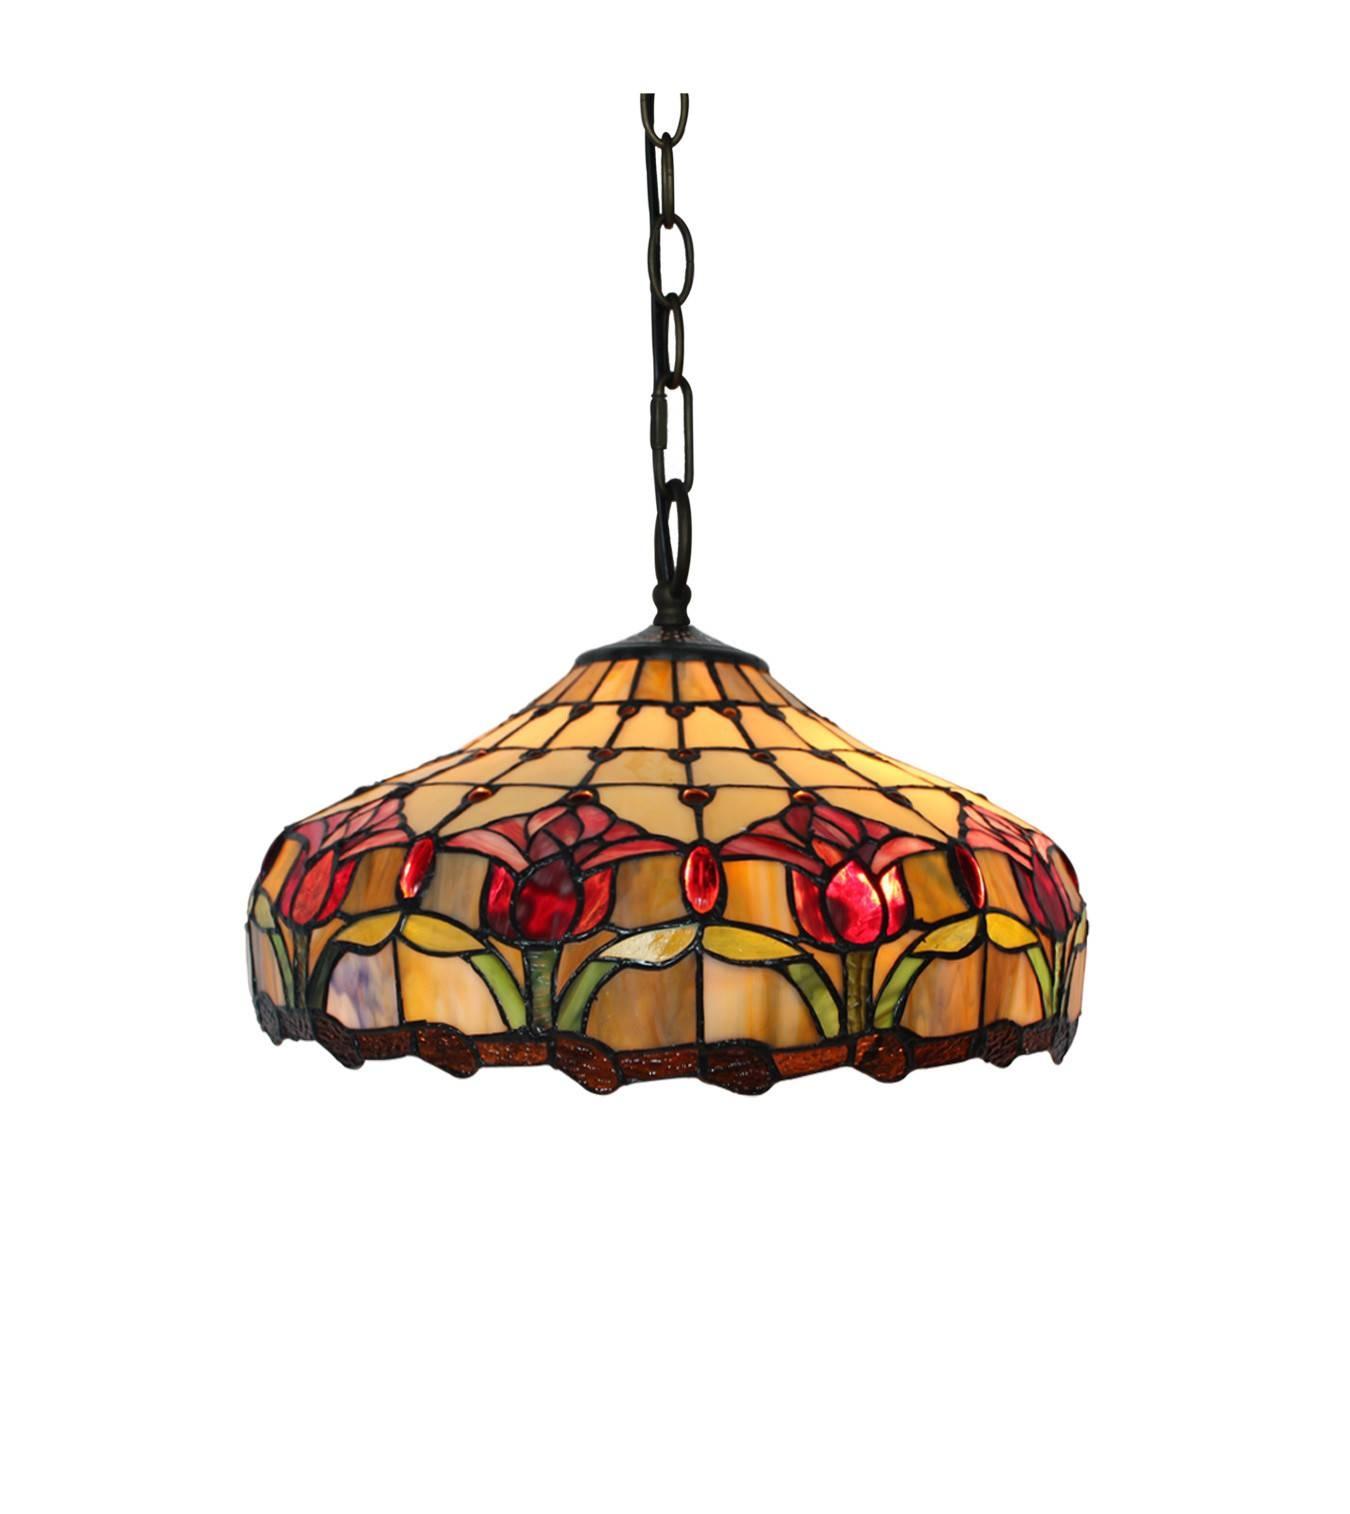 Tiffany Lighting | Temple & Webster inside Coloured Glass Pendant Lights (Image 15 of 15)